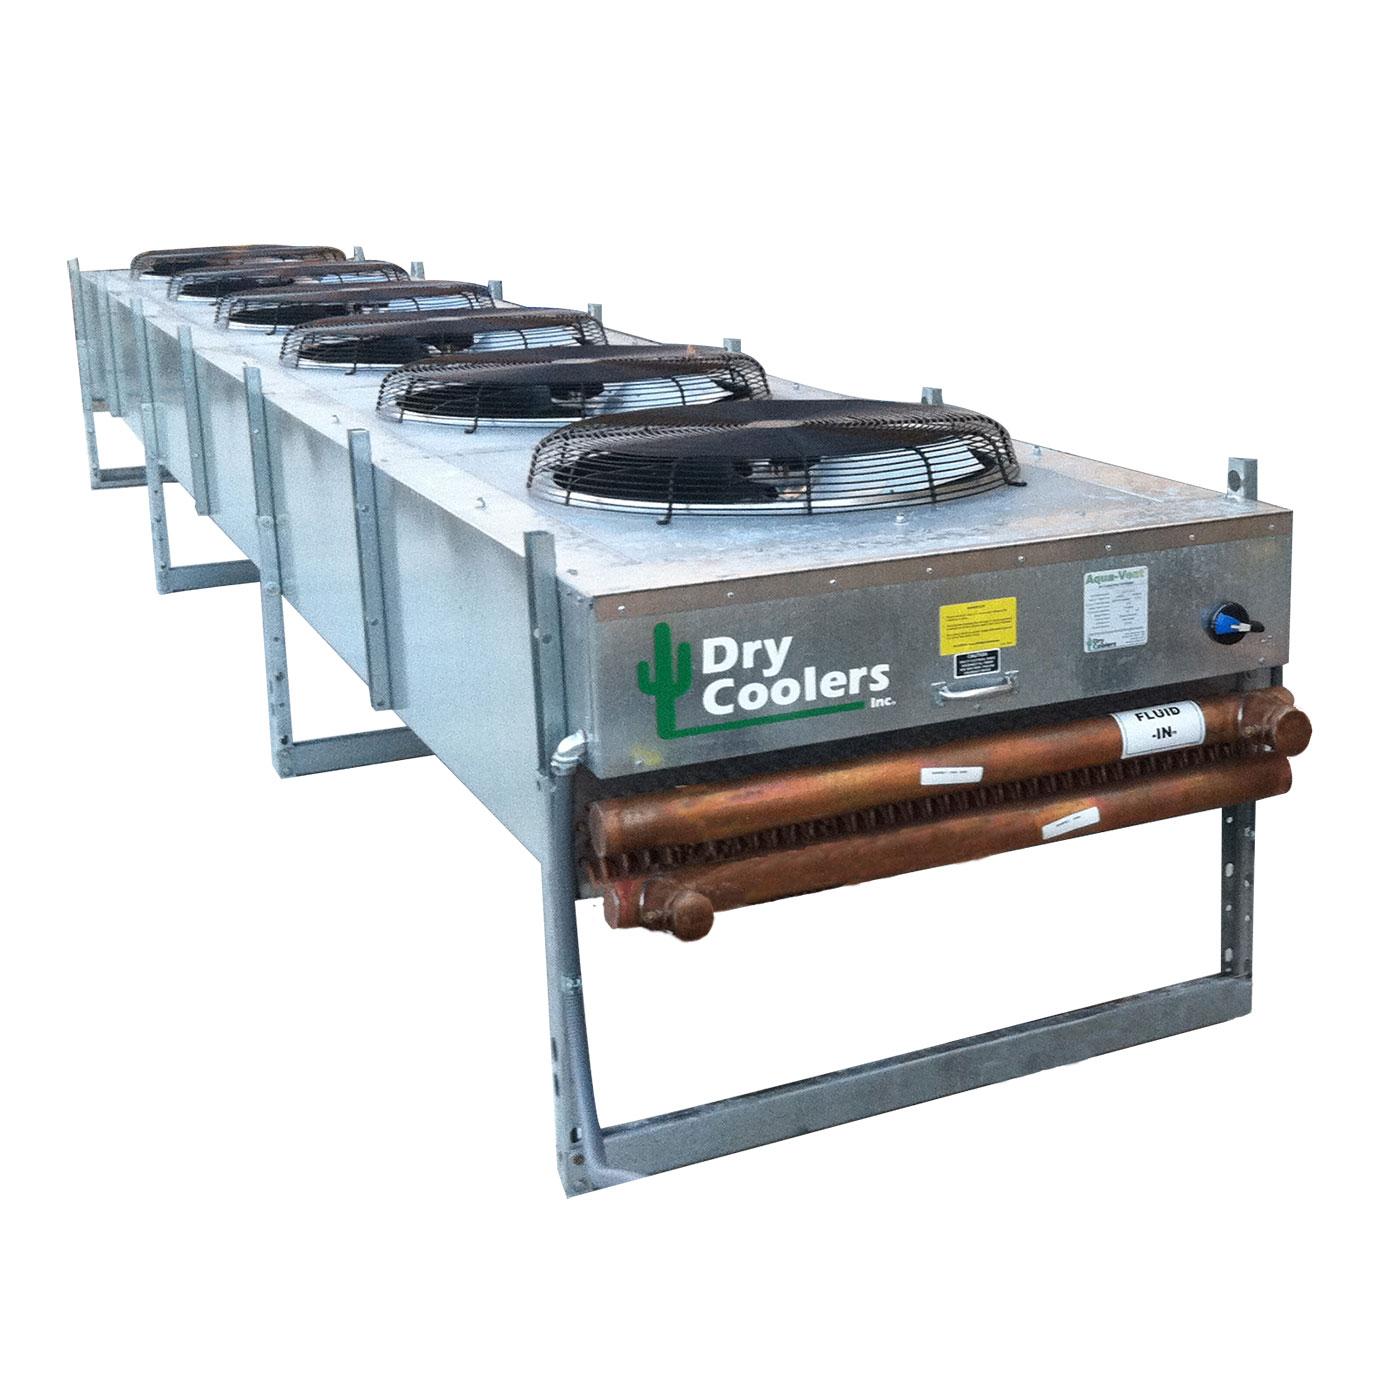 AquaVent AVR Air-Cooled Heat Exchanger